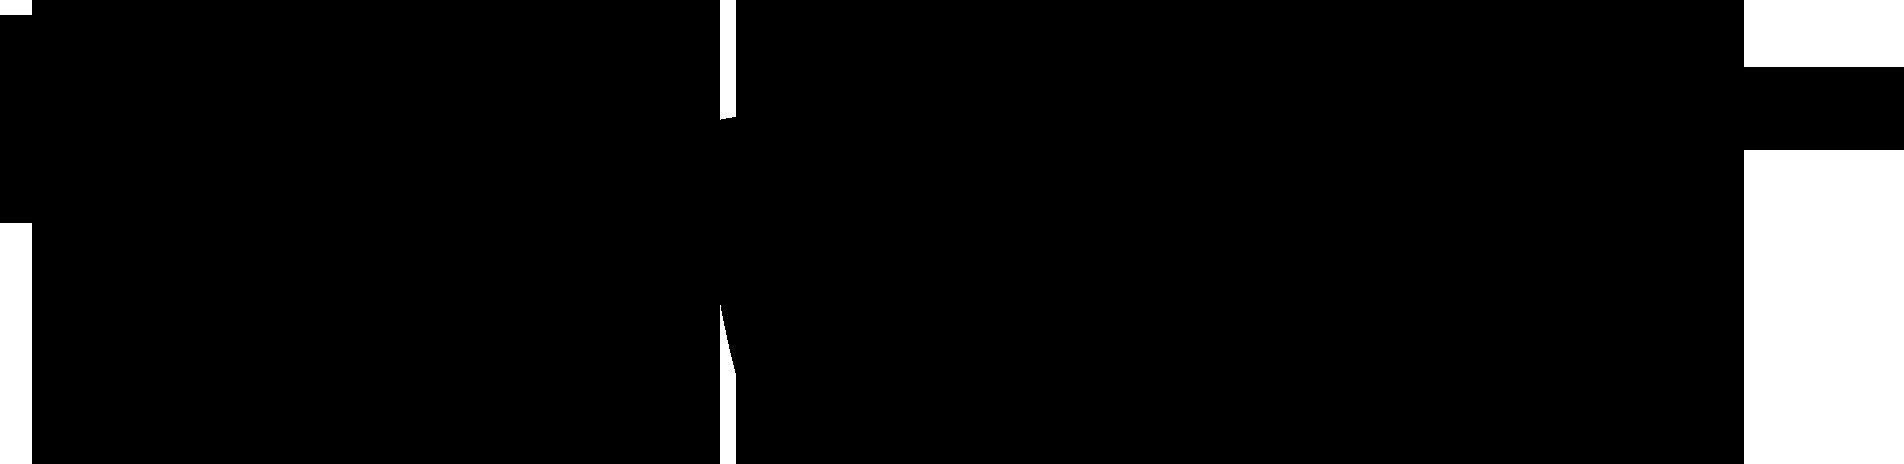 tomtrax-logo-mfk-01-02-2017